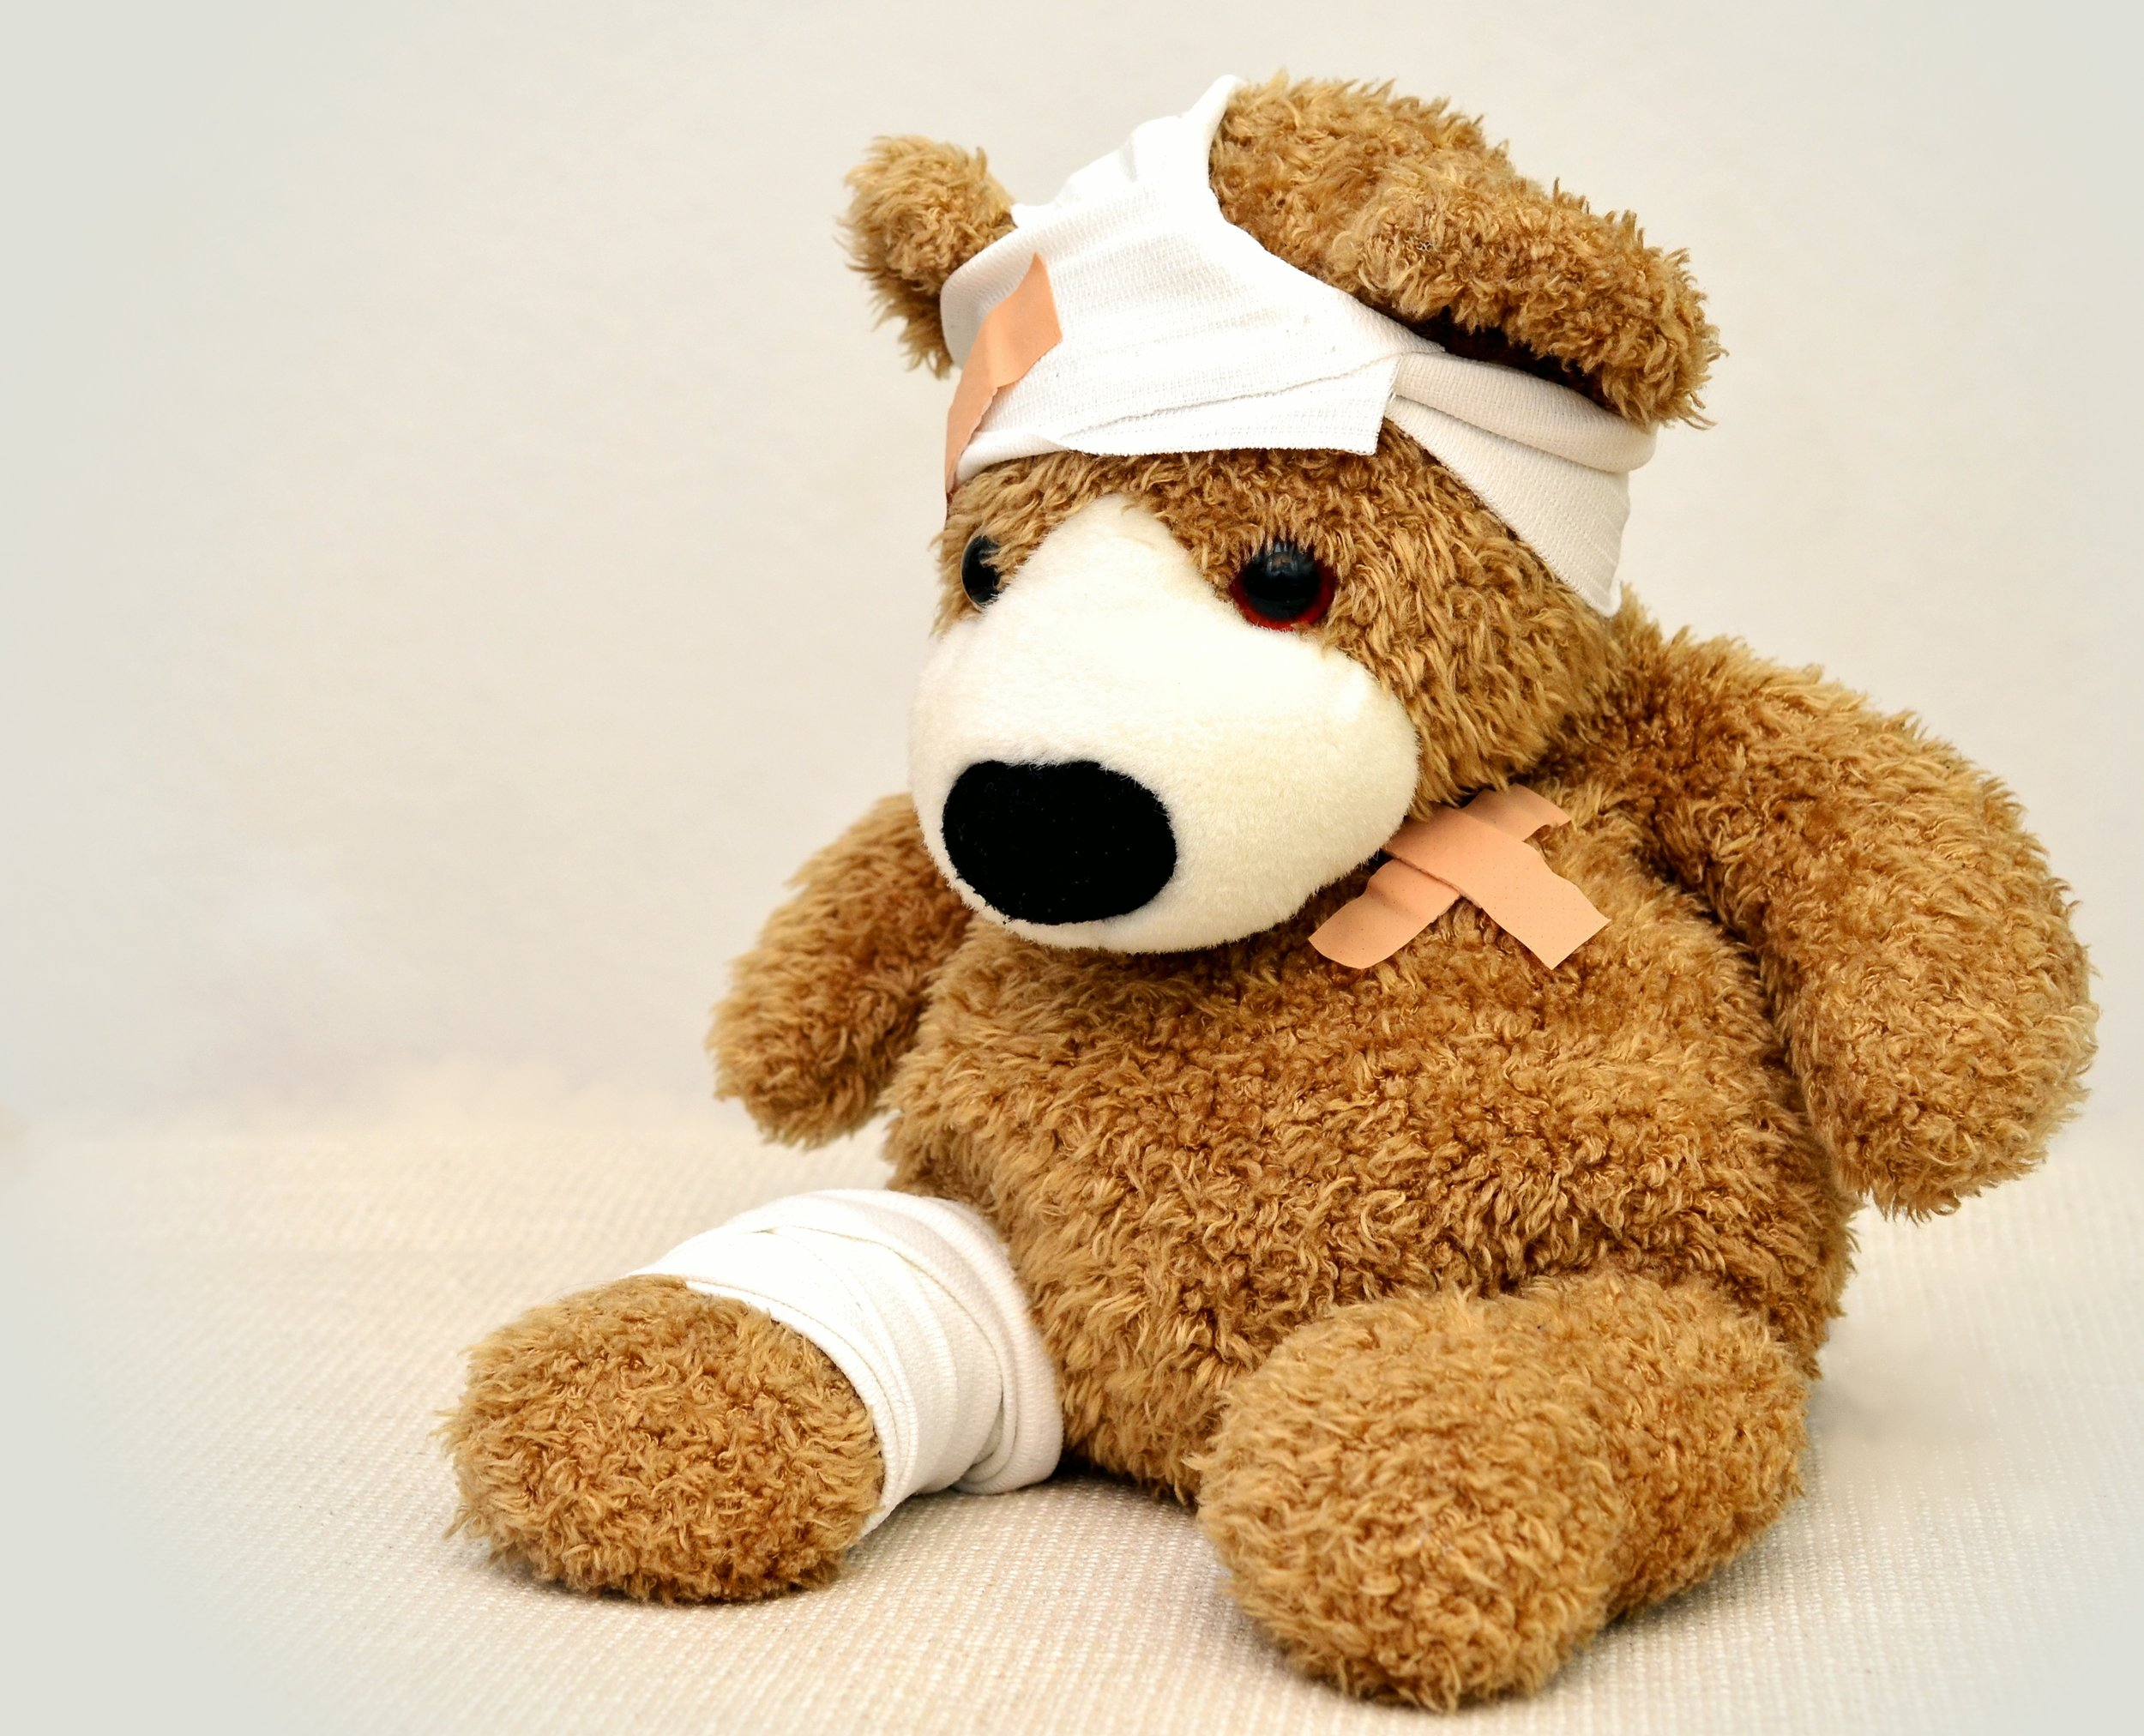 bandaged-teddy-bear.jpeg